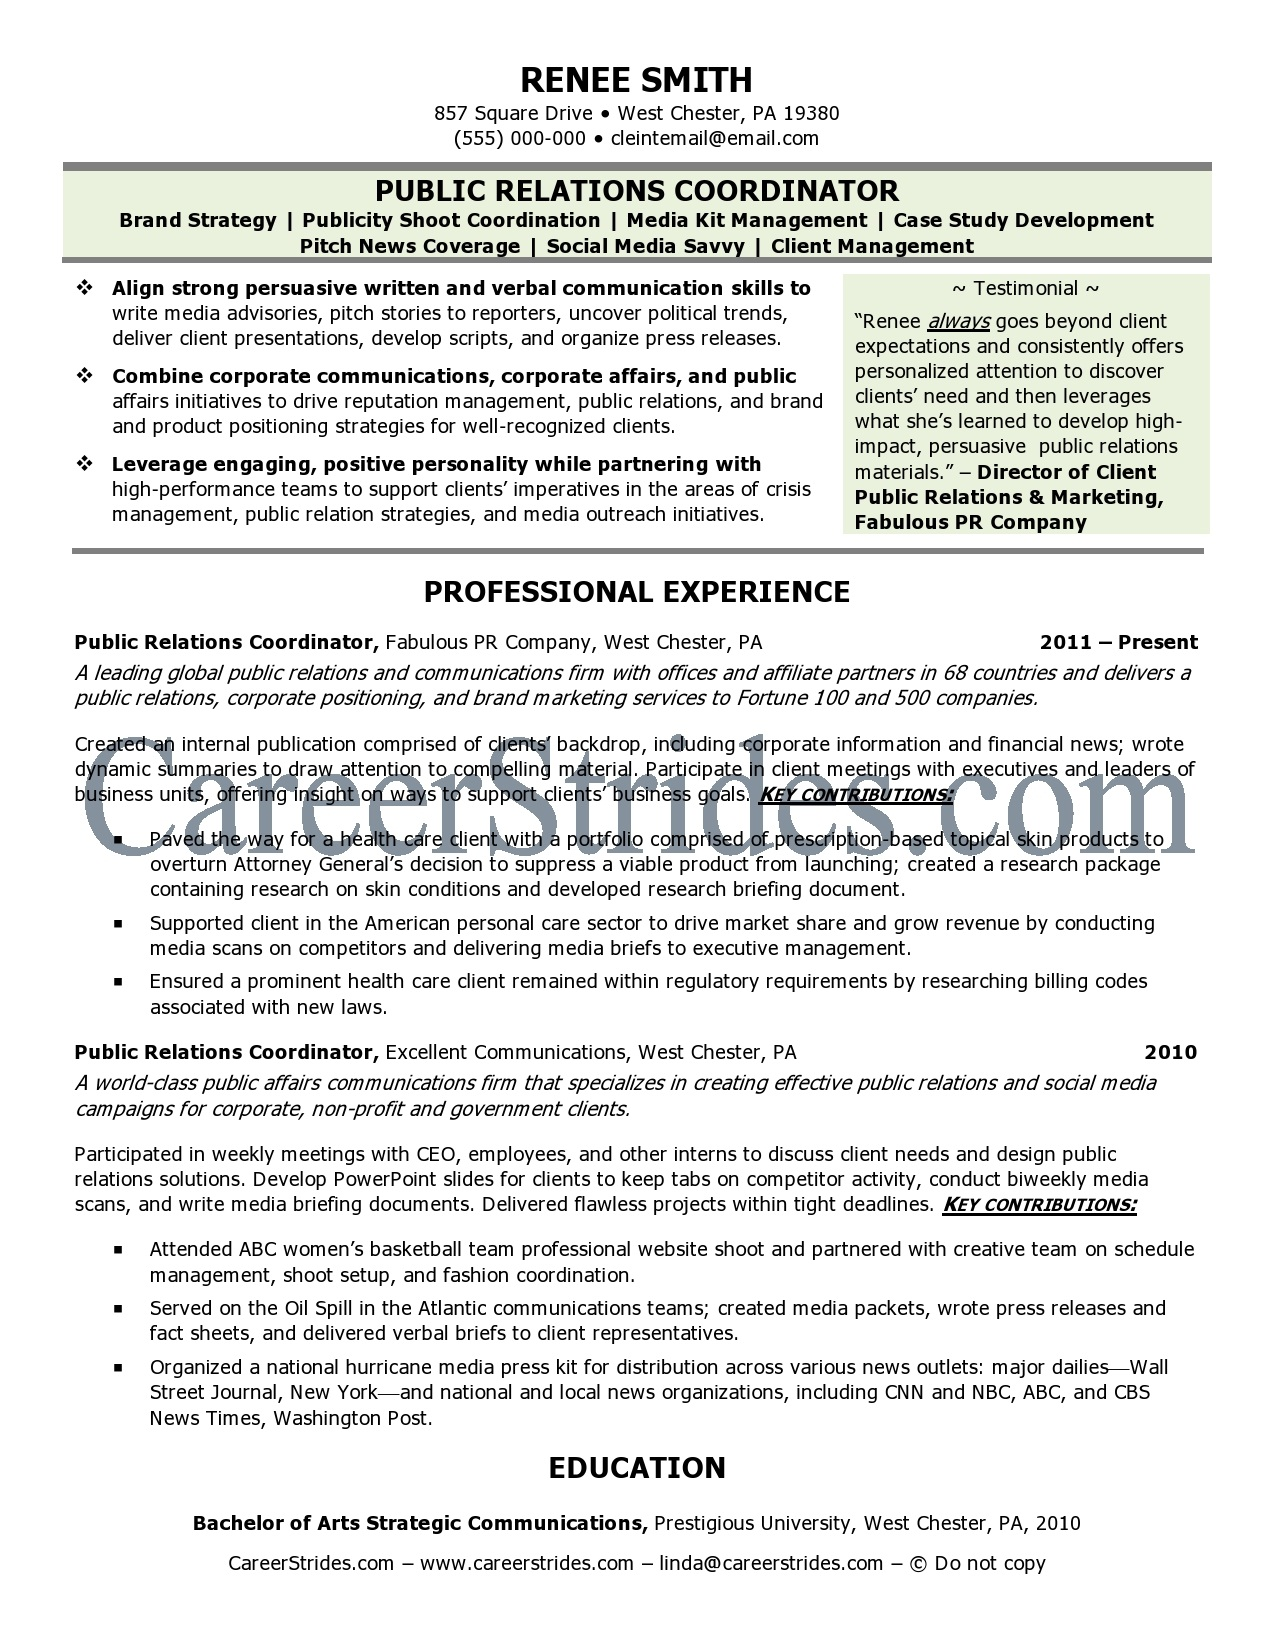 regulatory specialist sample resume tips for cover letter 521129749 public relations regulatory specialist sample resumehtml regulatory affairs resume - Regulatory Affairs Cover Letter